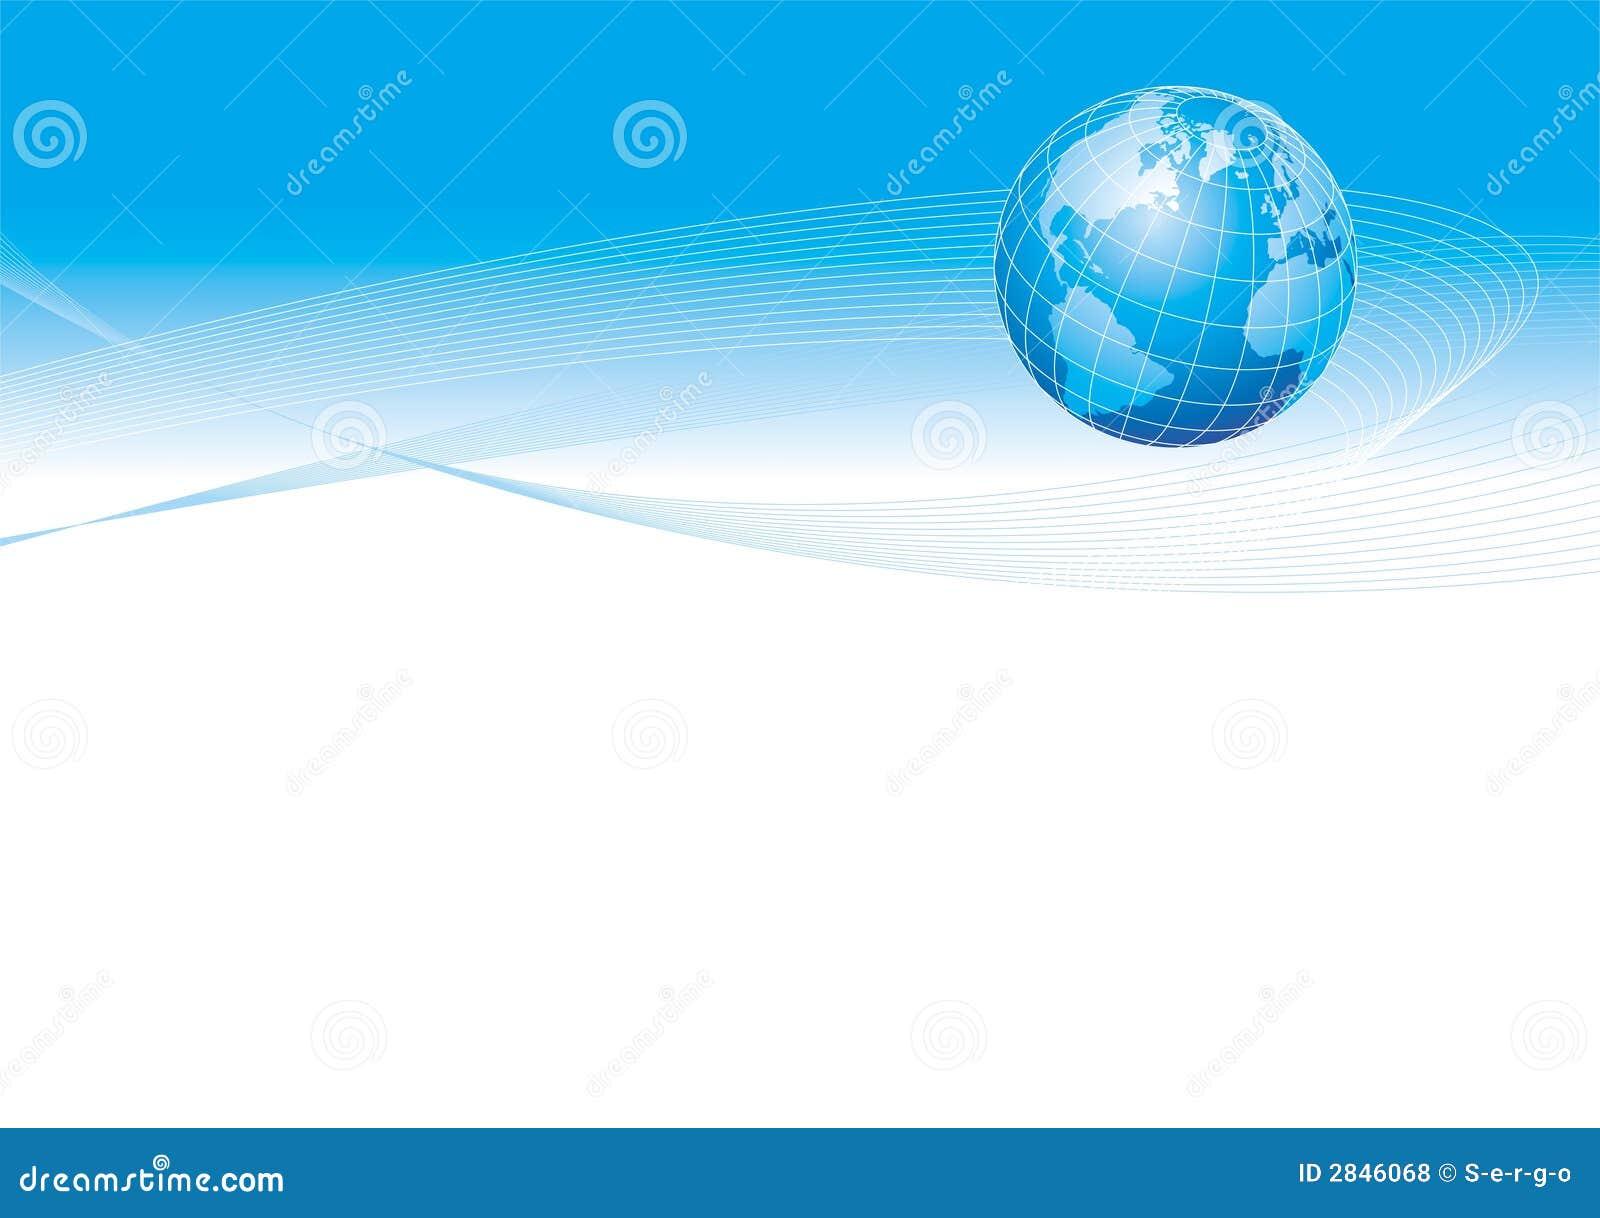 Illustration with globe